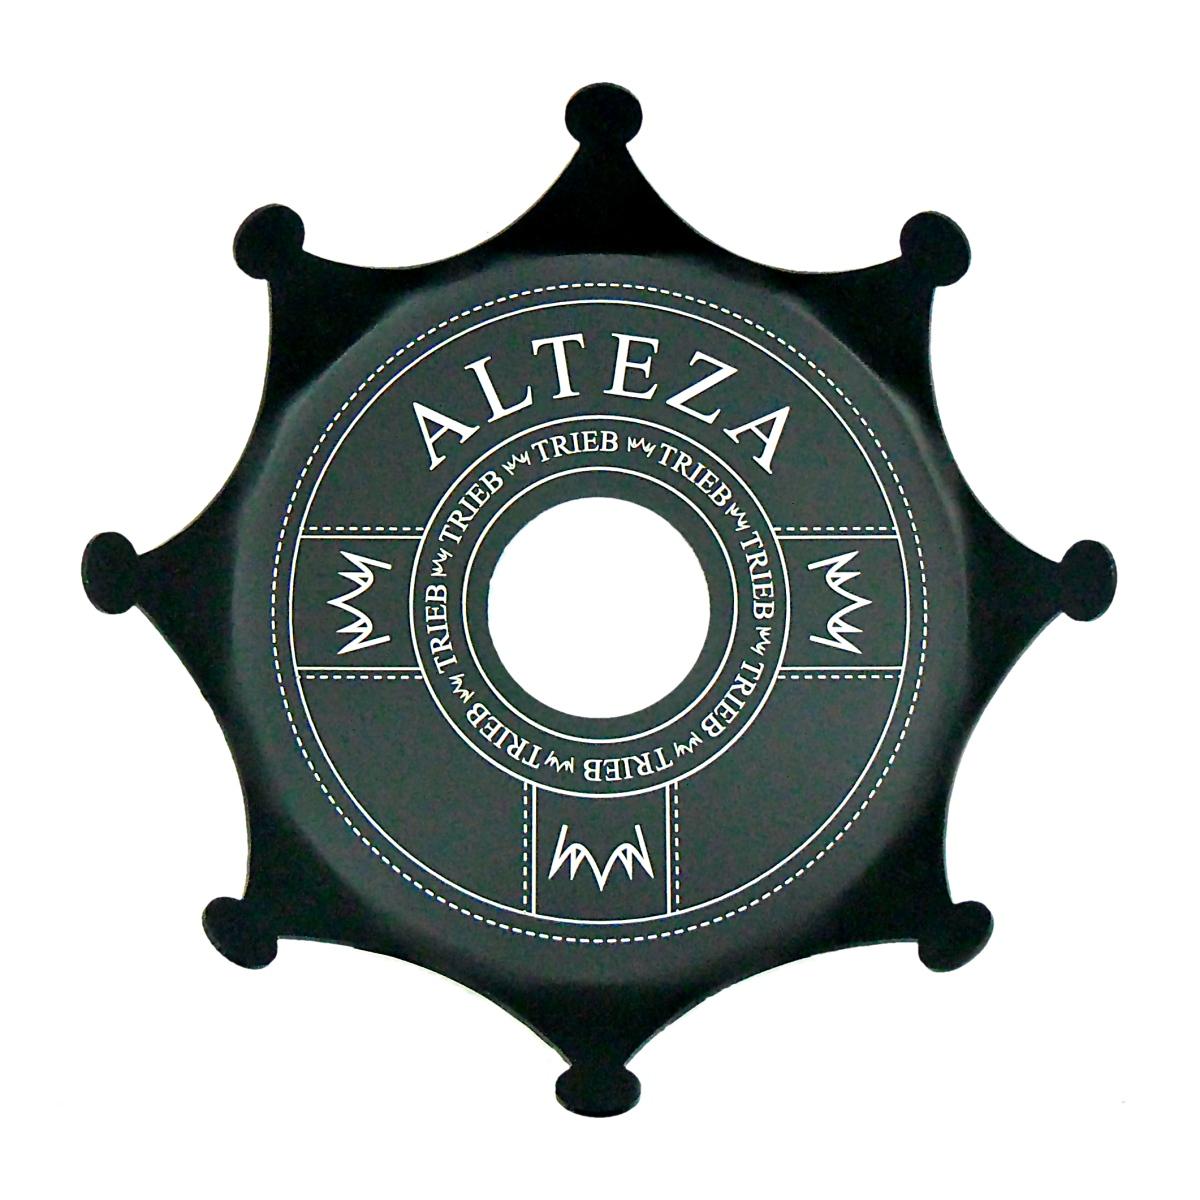 Prato para narguile TRIEB ALTEZA, alumínio textura acetinada e pintura anodizada. 18cm diâm.